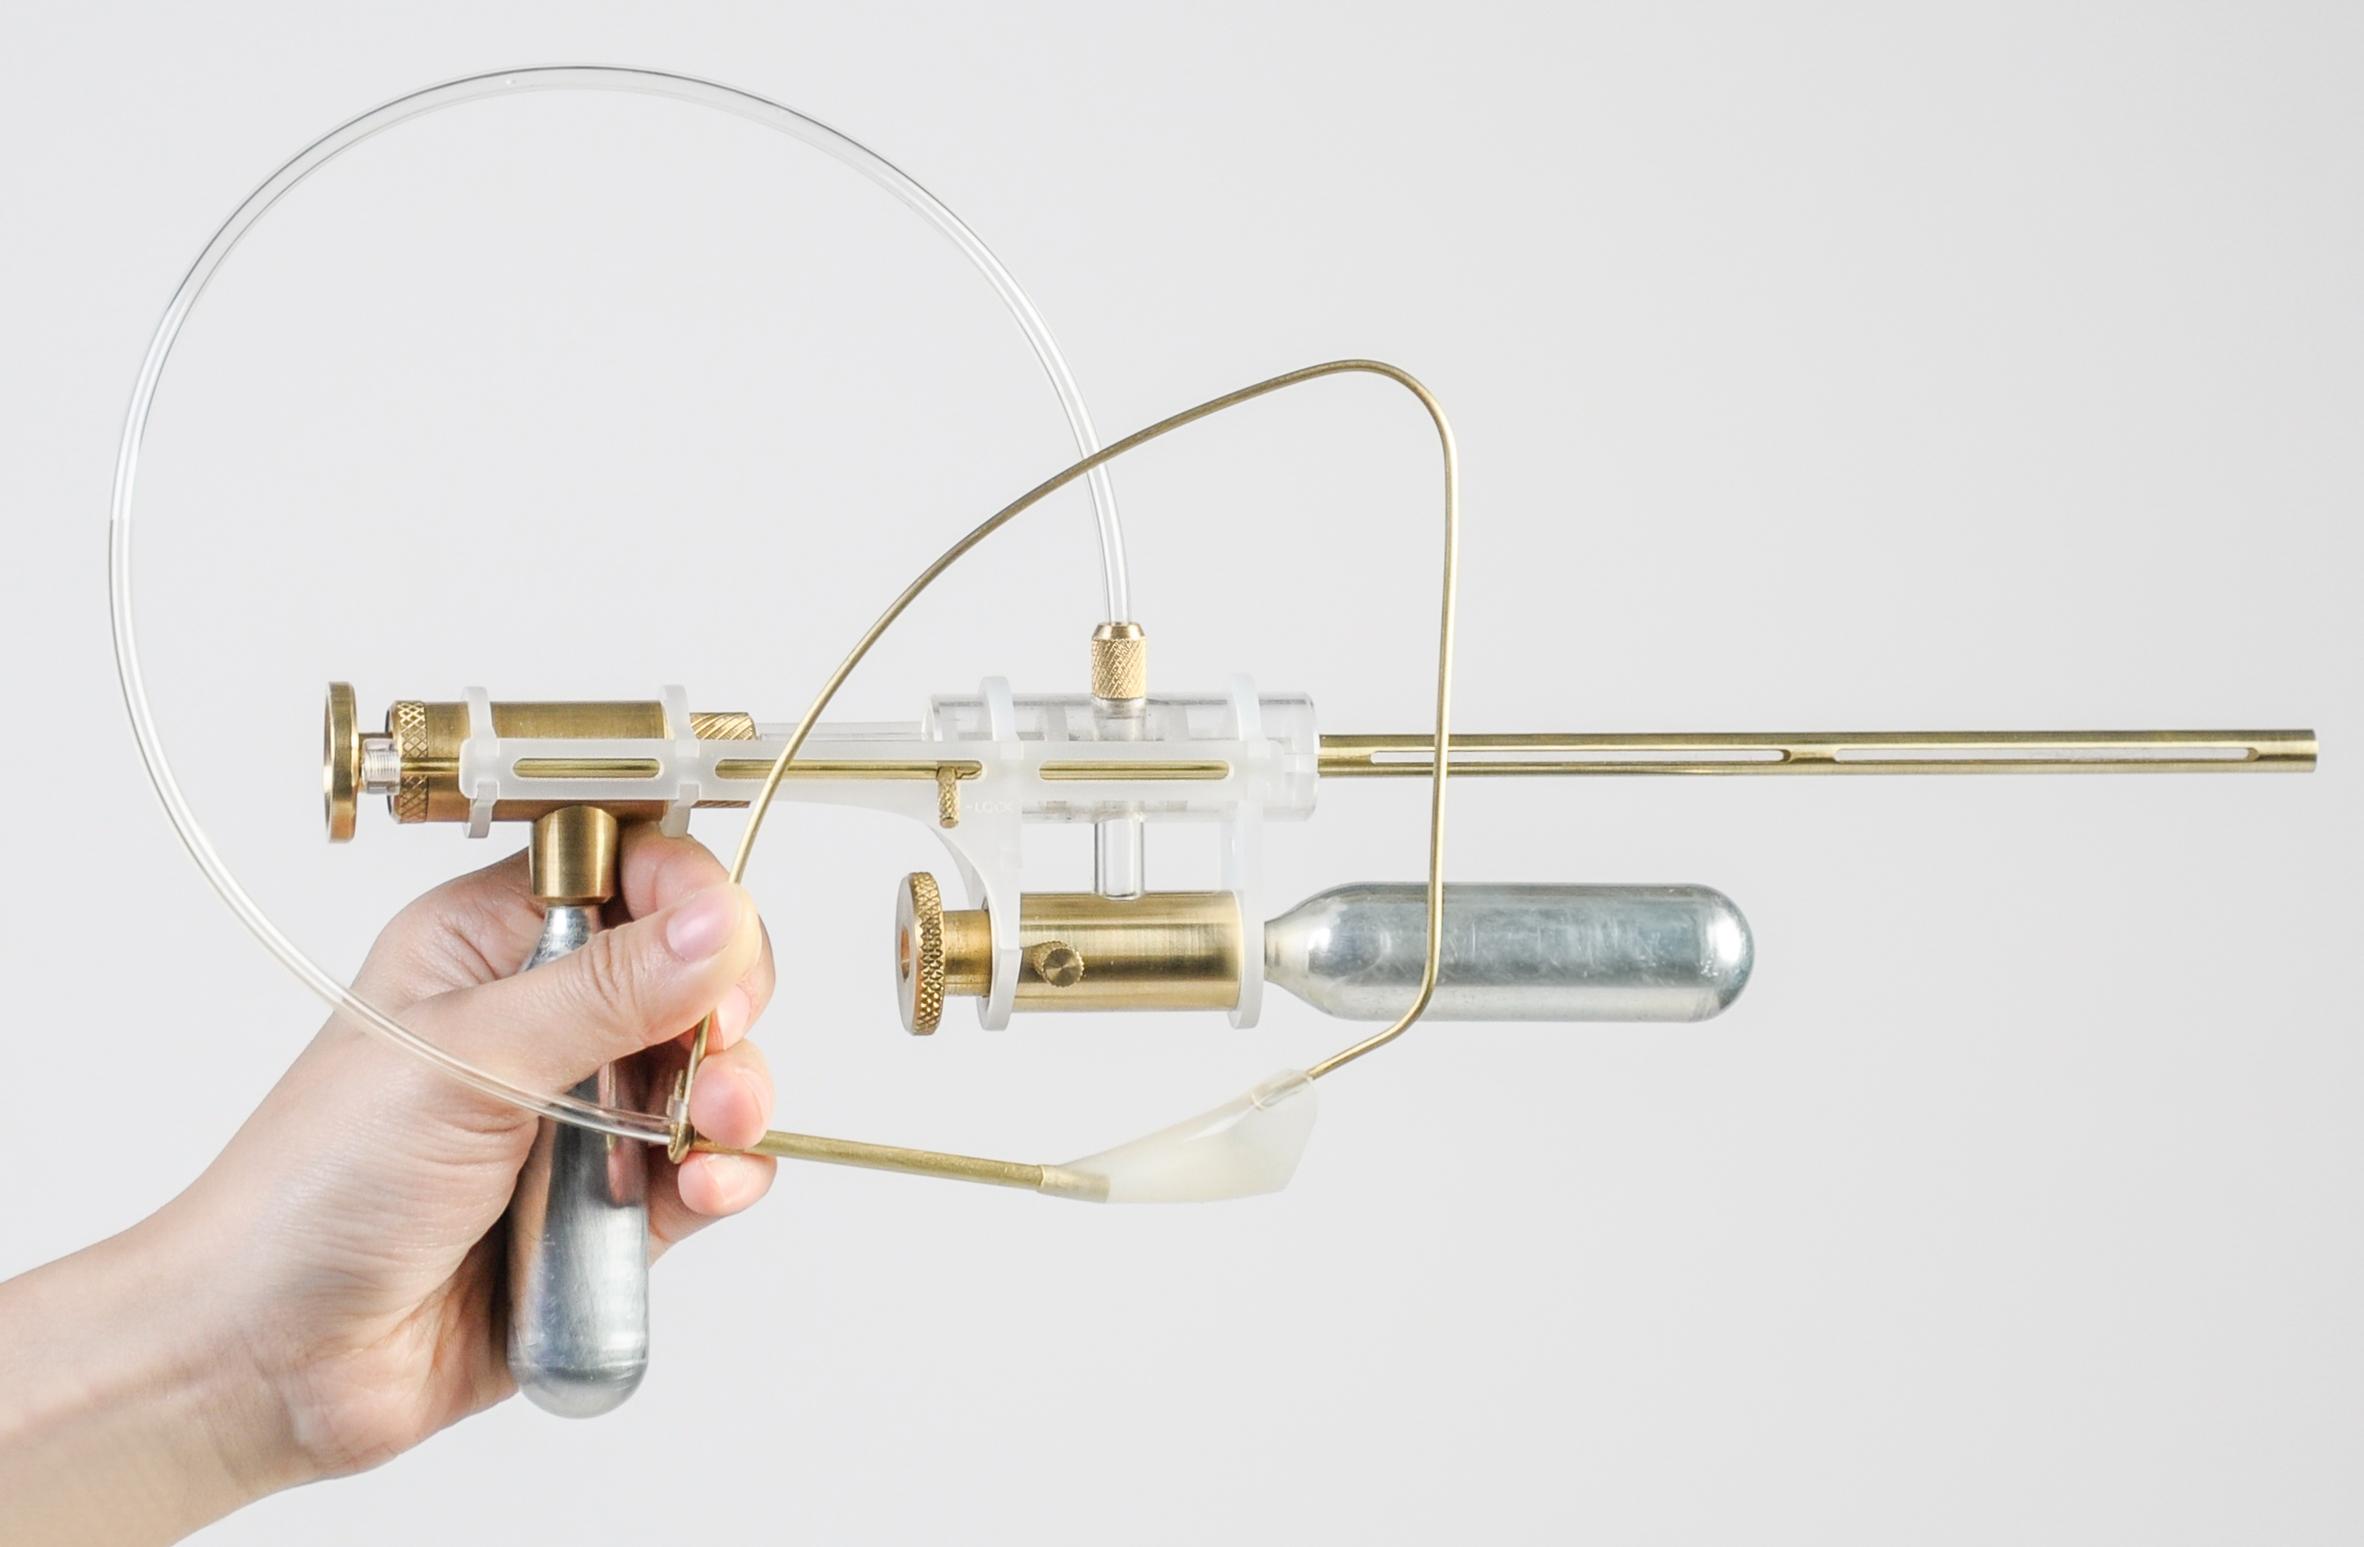 tear-gun-coneptual-product-design-yi-fei-chen-dutch-design-wekk-2016_dezeen_col_0.jpg